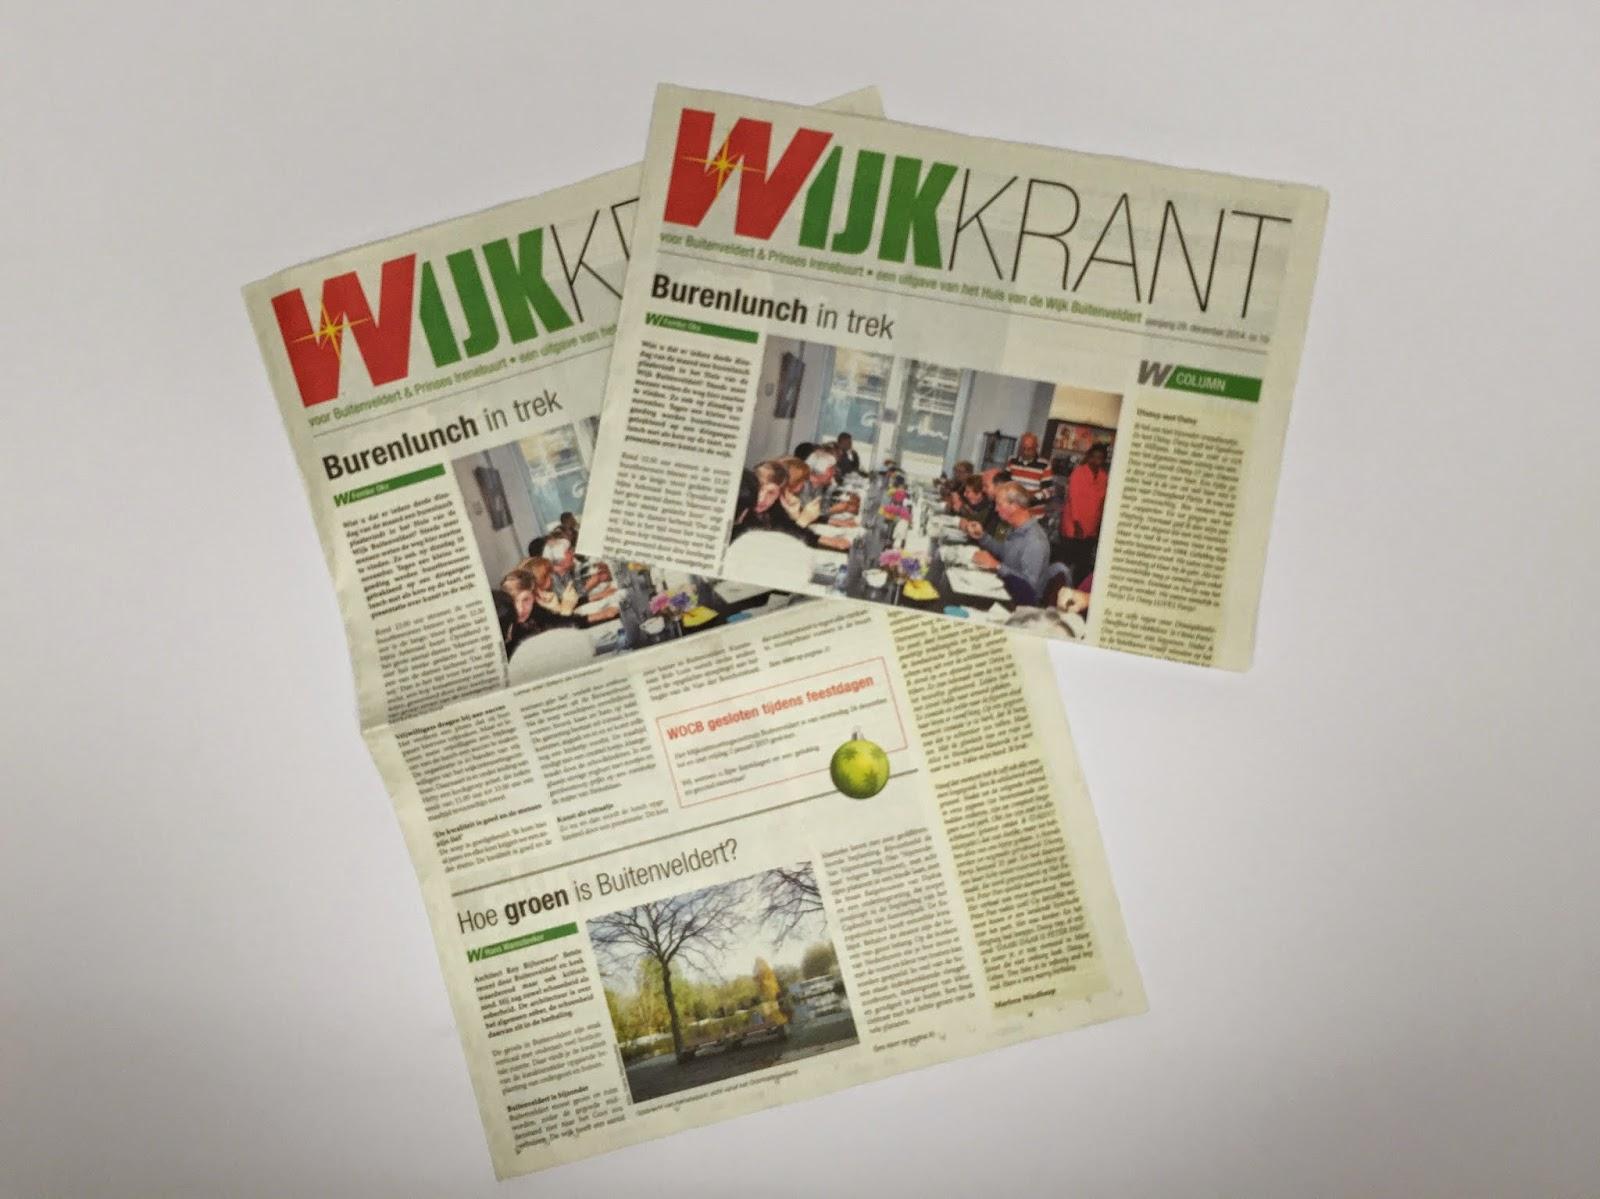 http://printingpower.nl/Promotie/Kranten